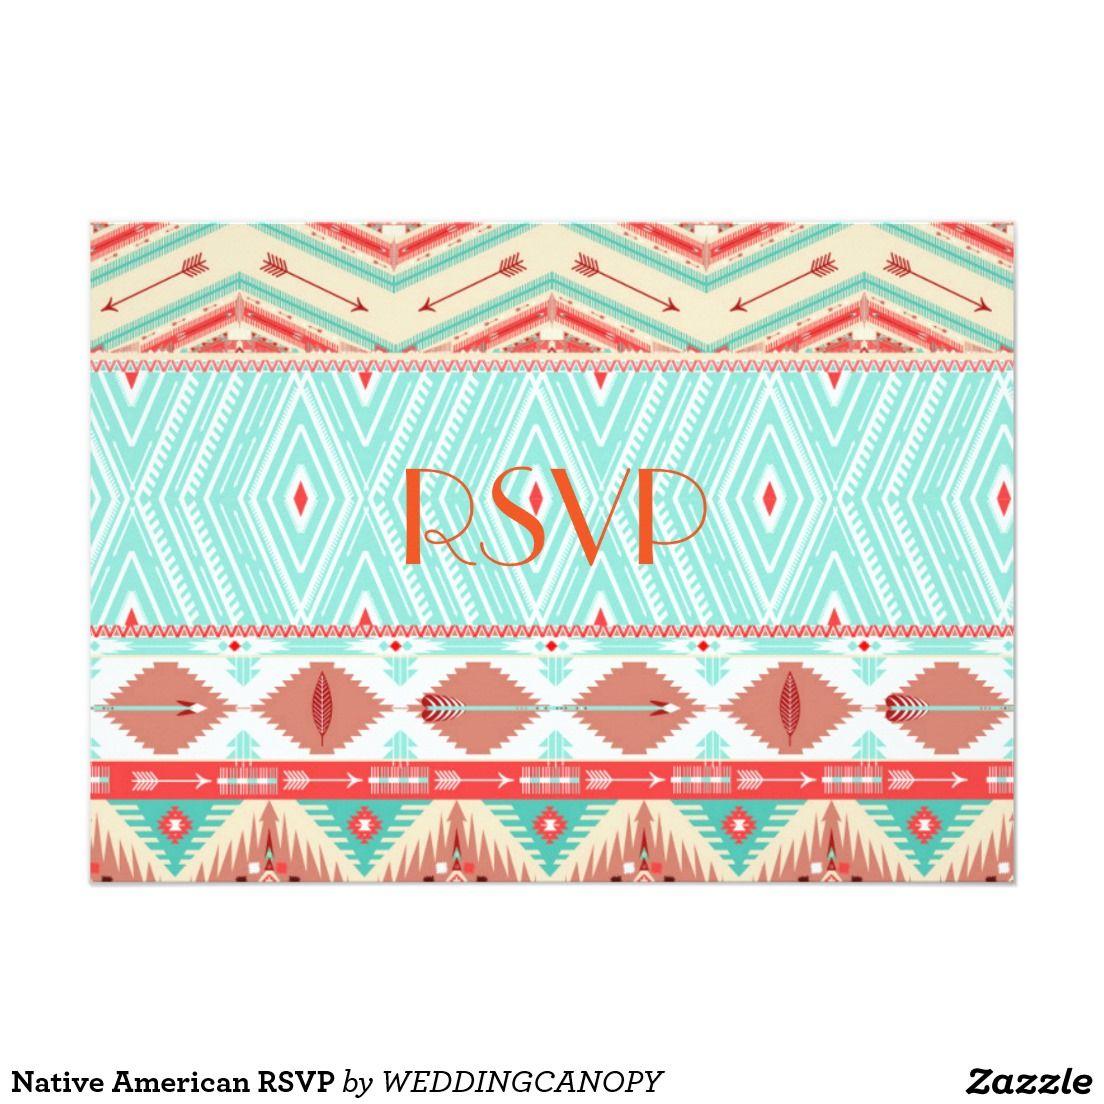 Native american rsvp invitation diy pinterest rsvp native